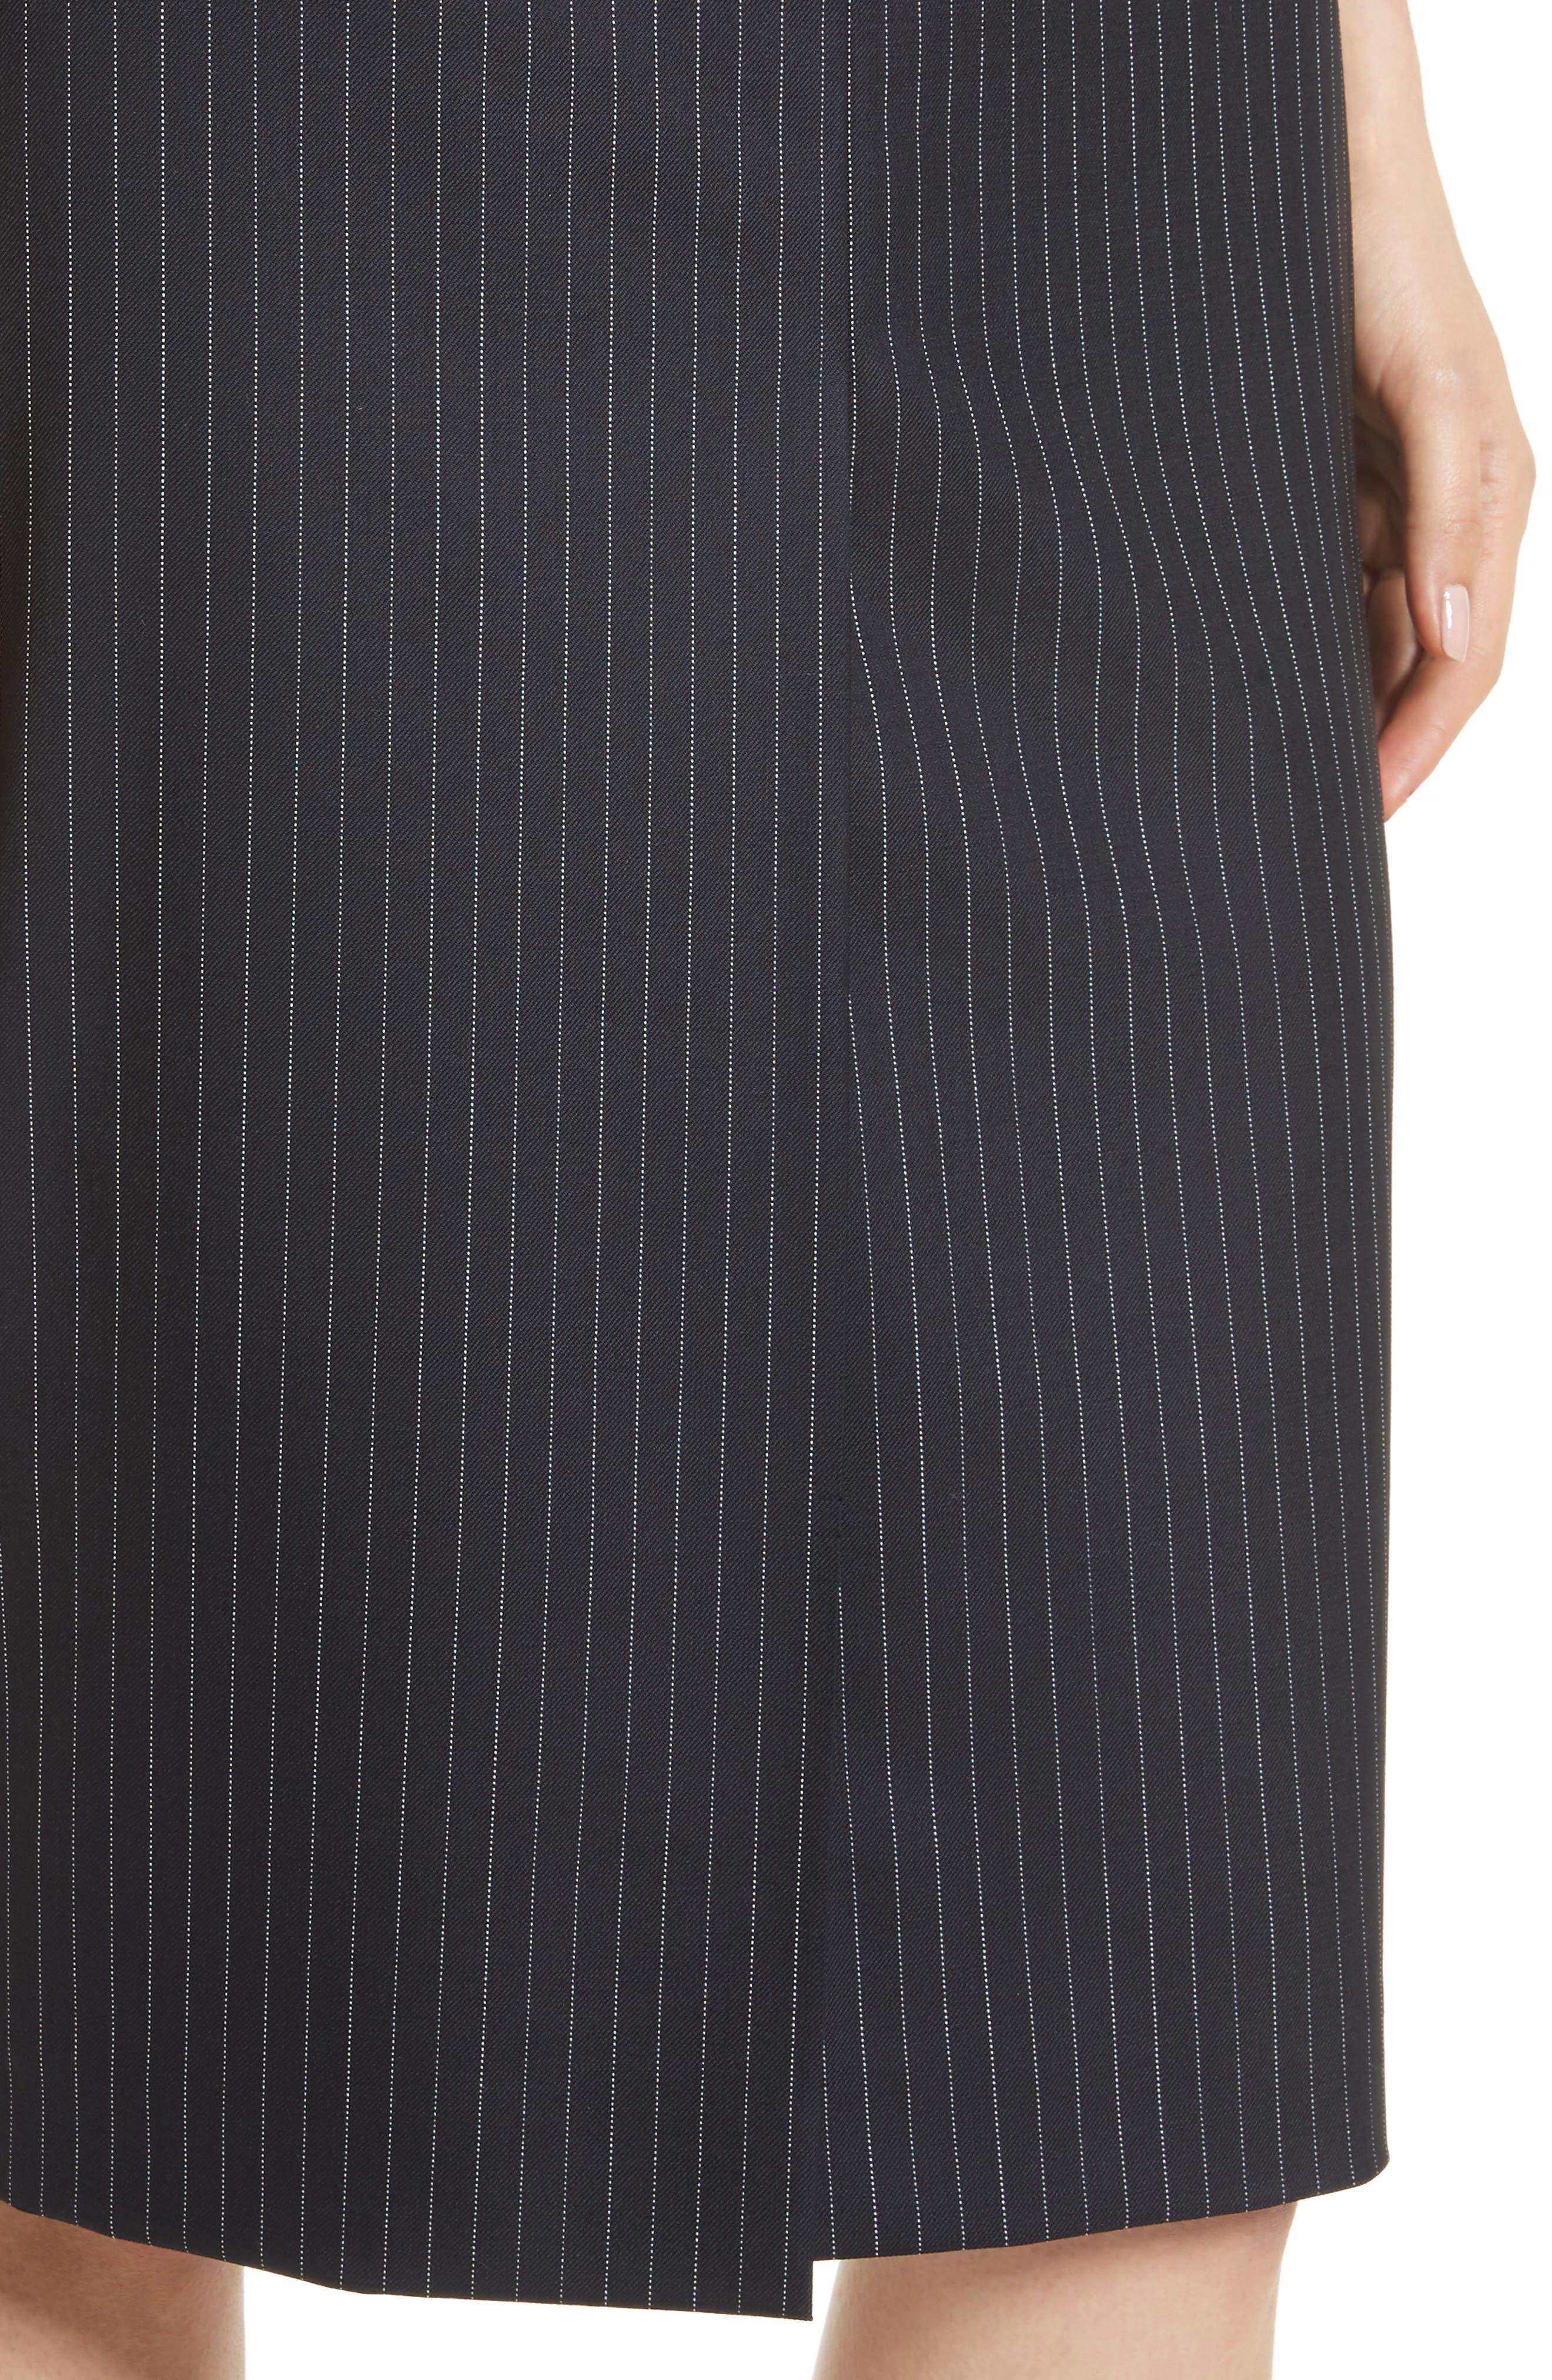 Abba Pinstripe Pencil Skirt,                             Alternate thumbnail 4, color,                             411